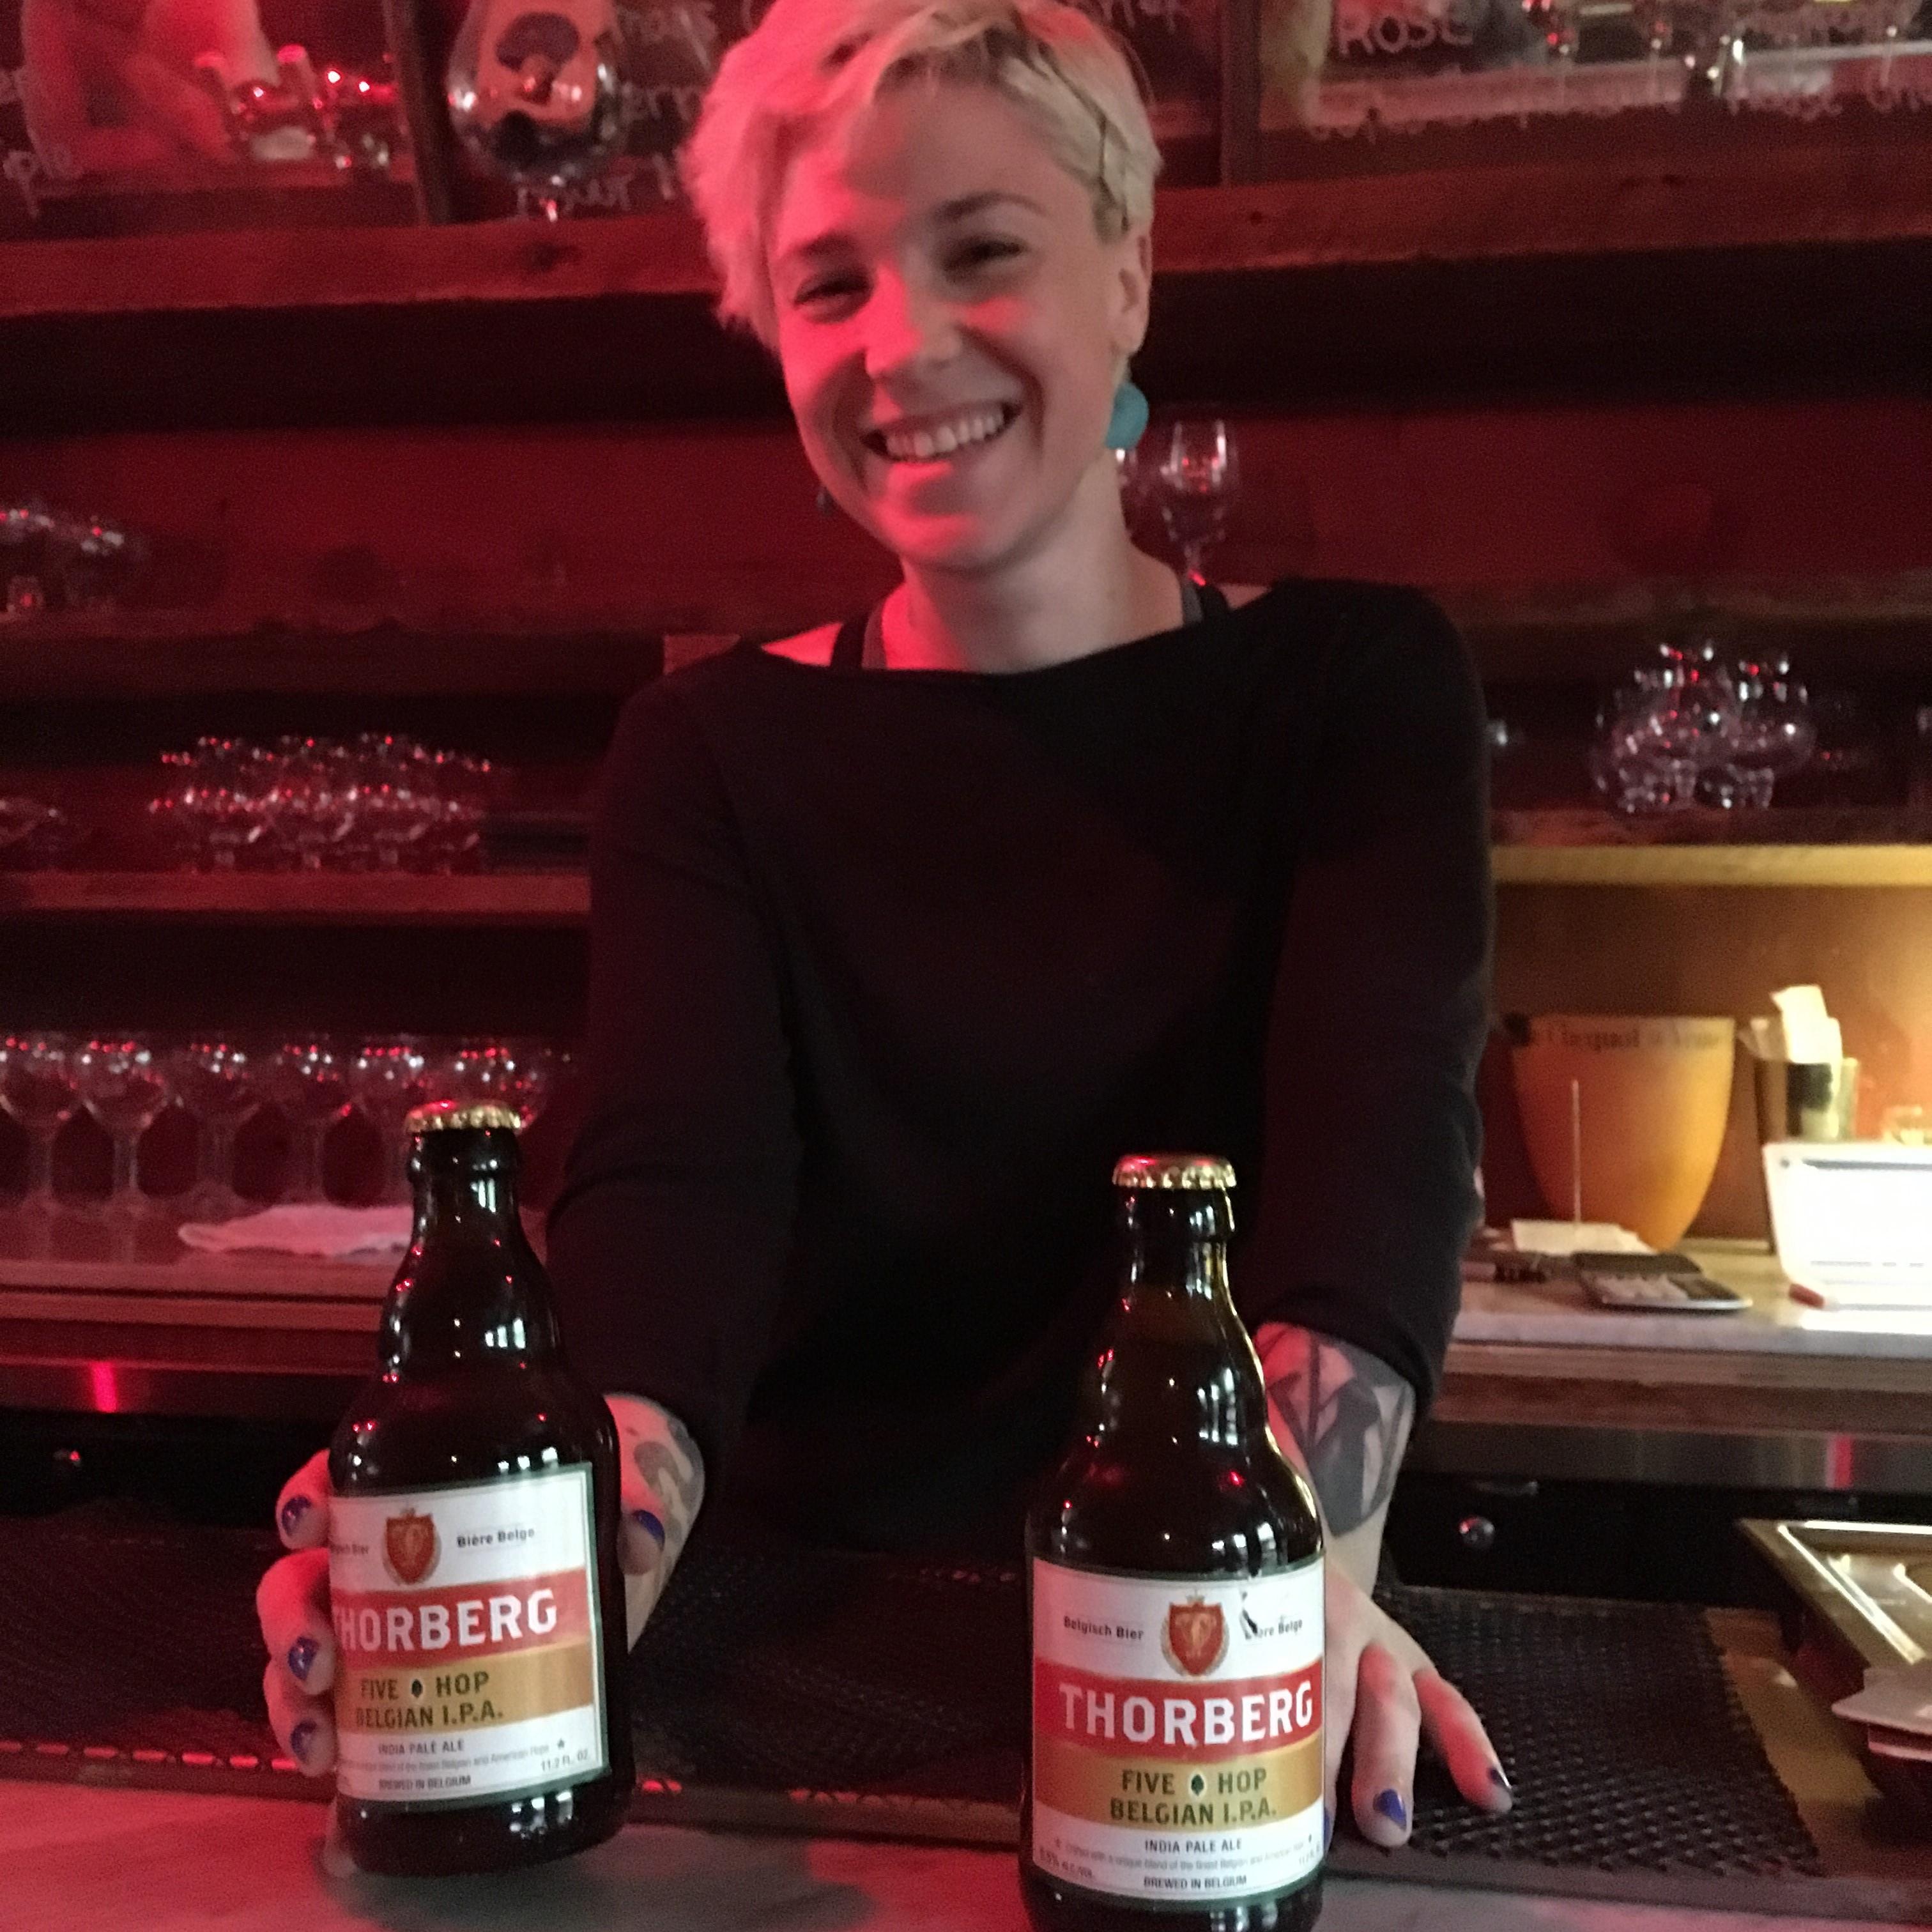 Craft beer in New York Thorberg best Belgian Ipa